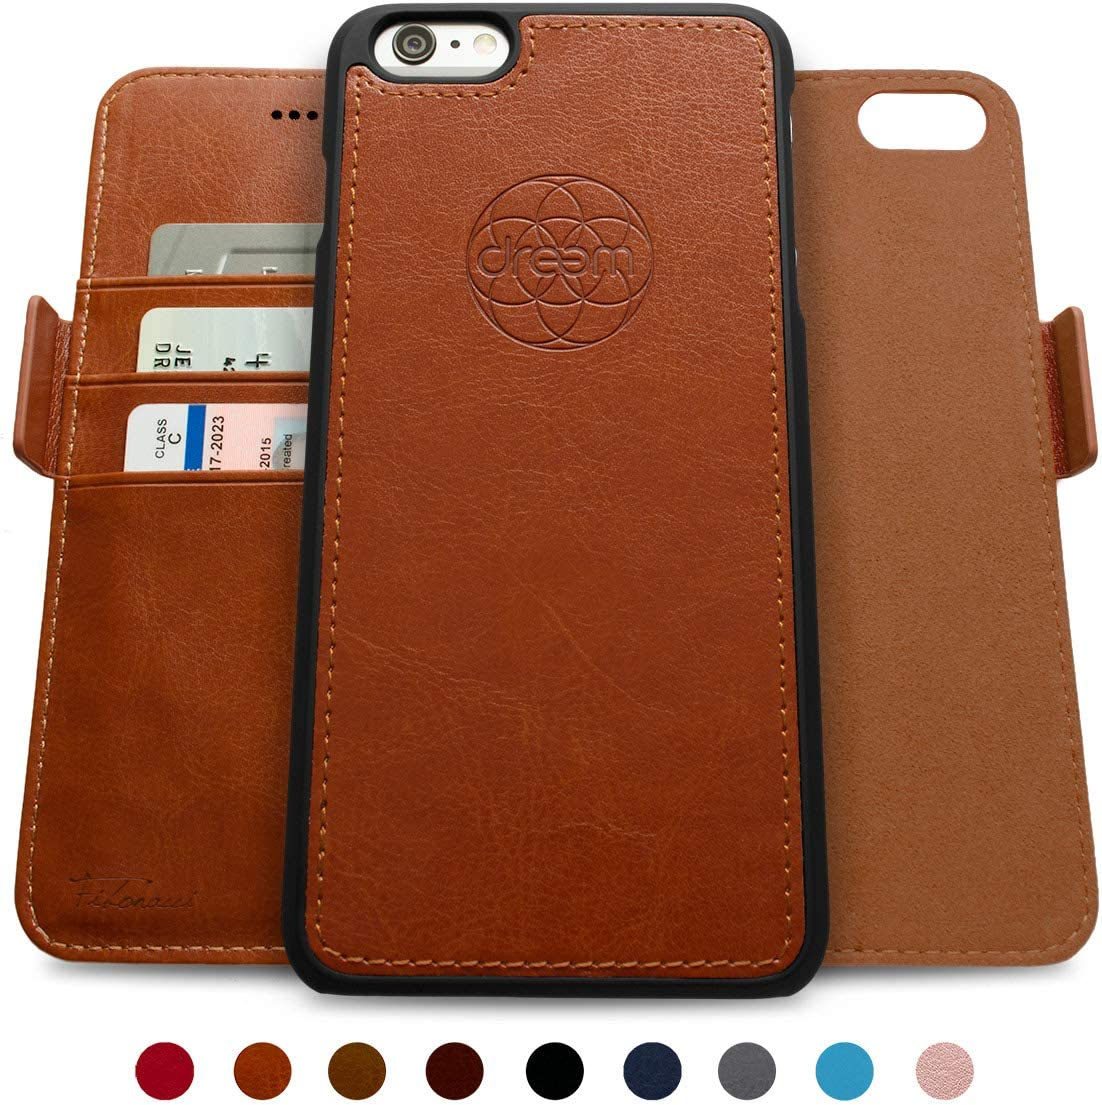 Dreem Fibonacci 2-in-1 Wallet-Case for iPhone 6-Plus & 6s-Plus, Magnetic Detachable Shock-Proof TPU Slim-Case, RFID Protection, 2-Way Stand, Luxury Vegan Leather, GiftBox - Caramel